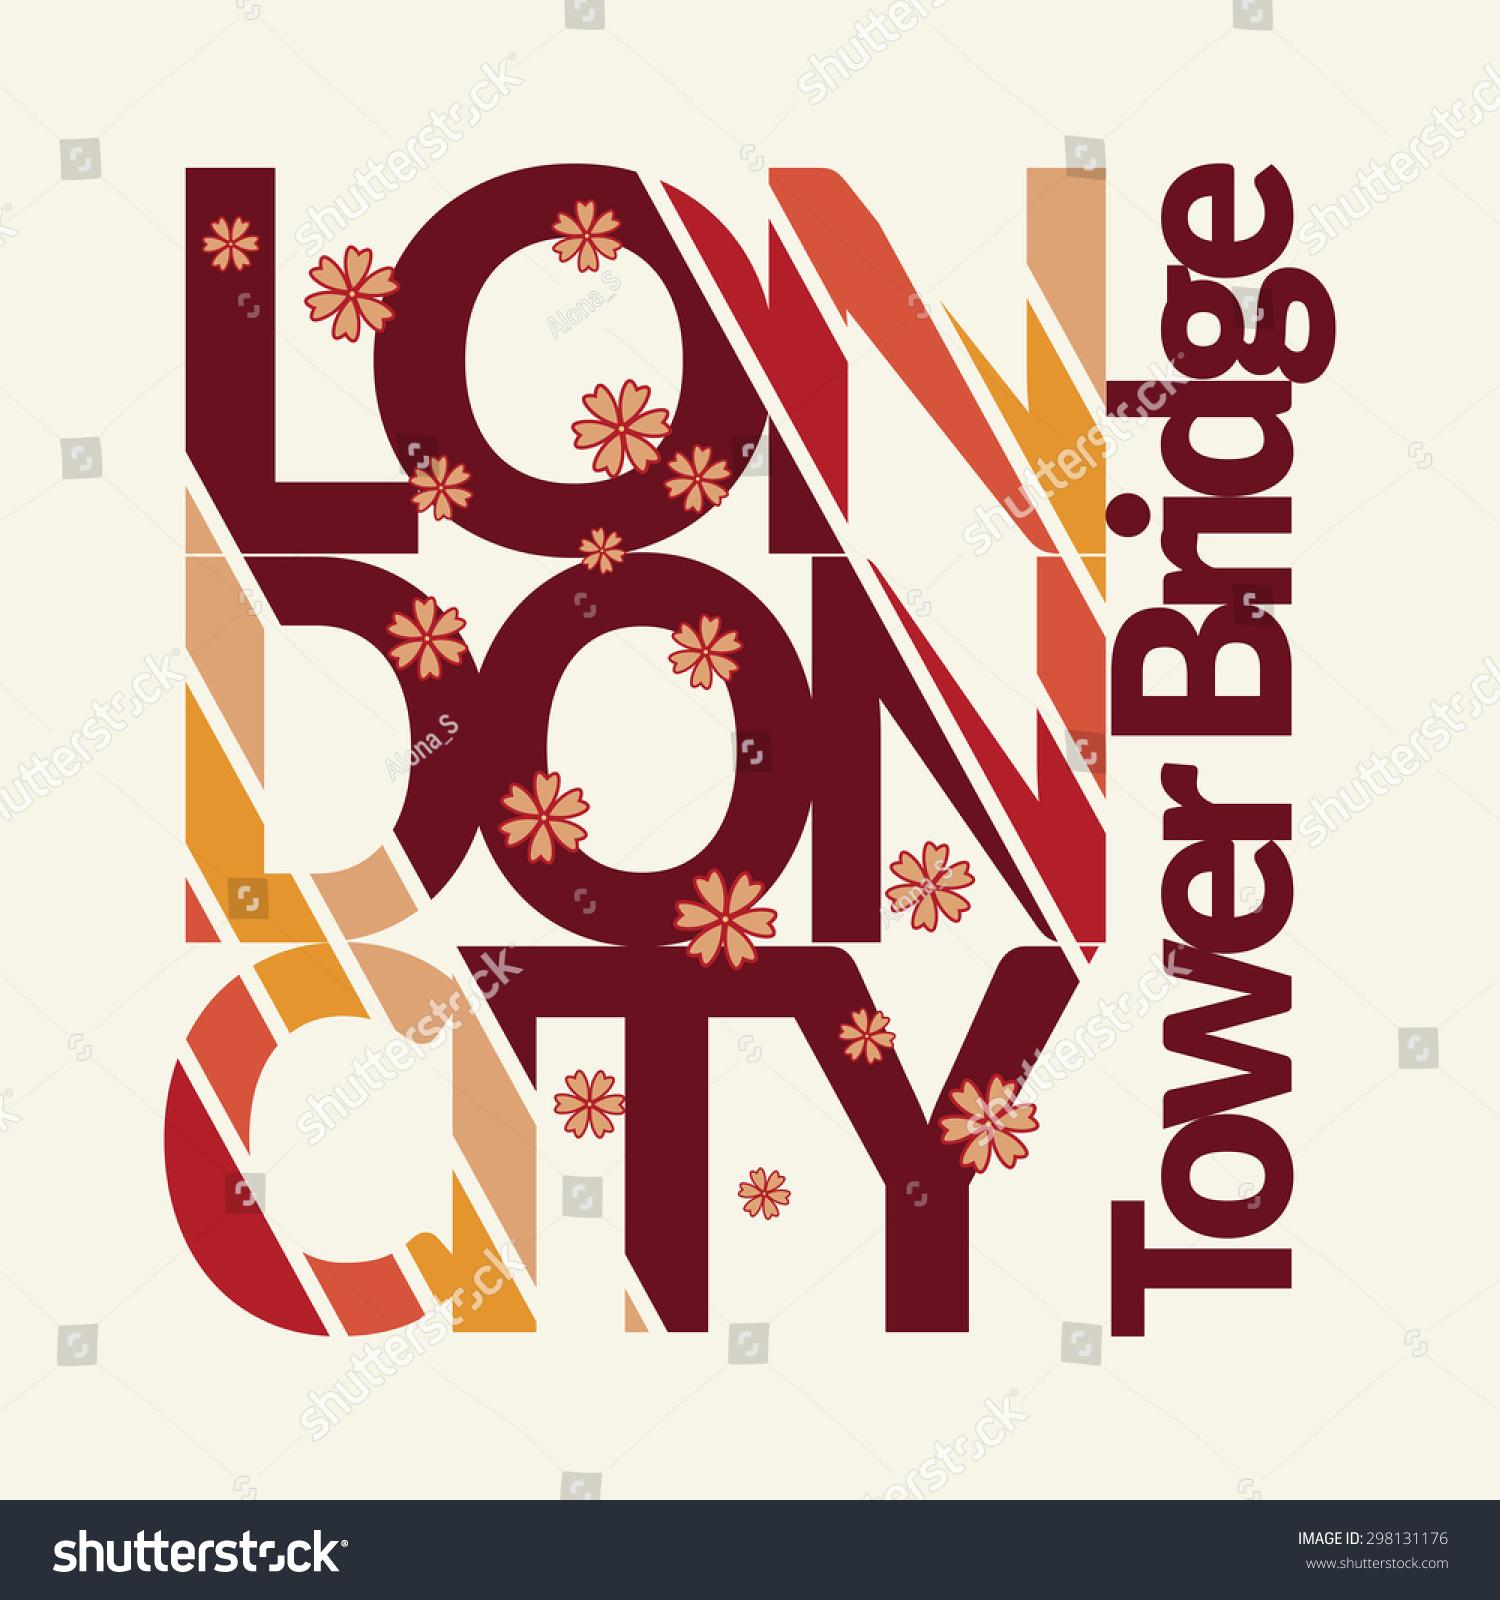 Shirt design london - Capital Of Fashion And Tourism T Shirt Graphic Design London Typography Emblem